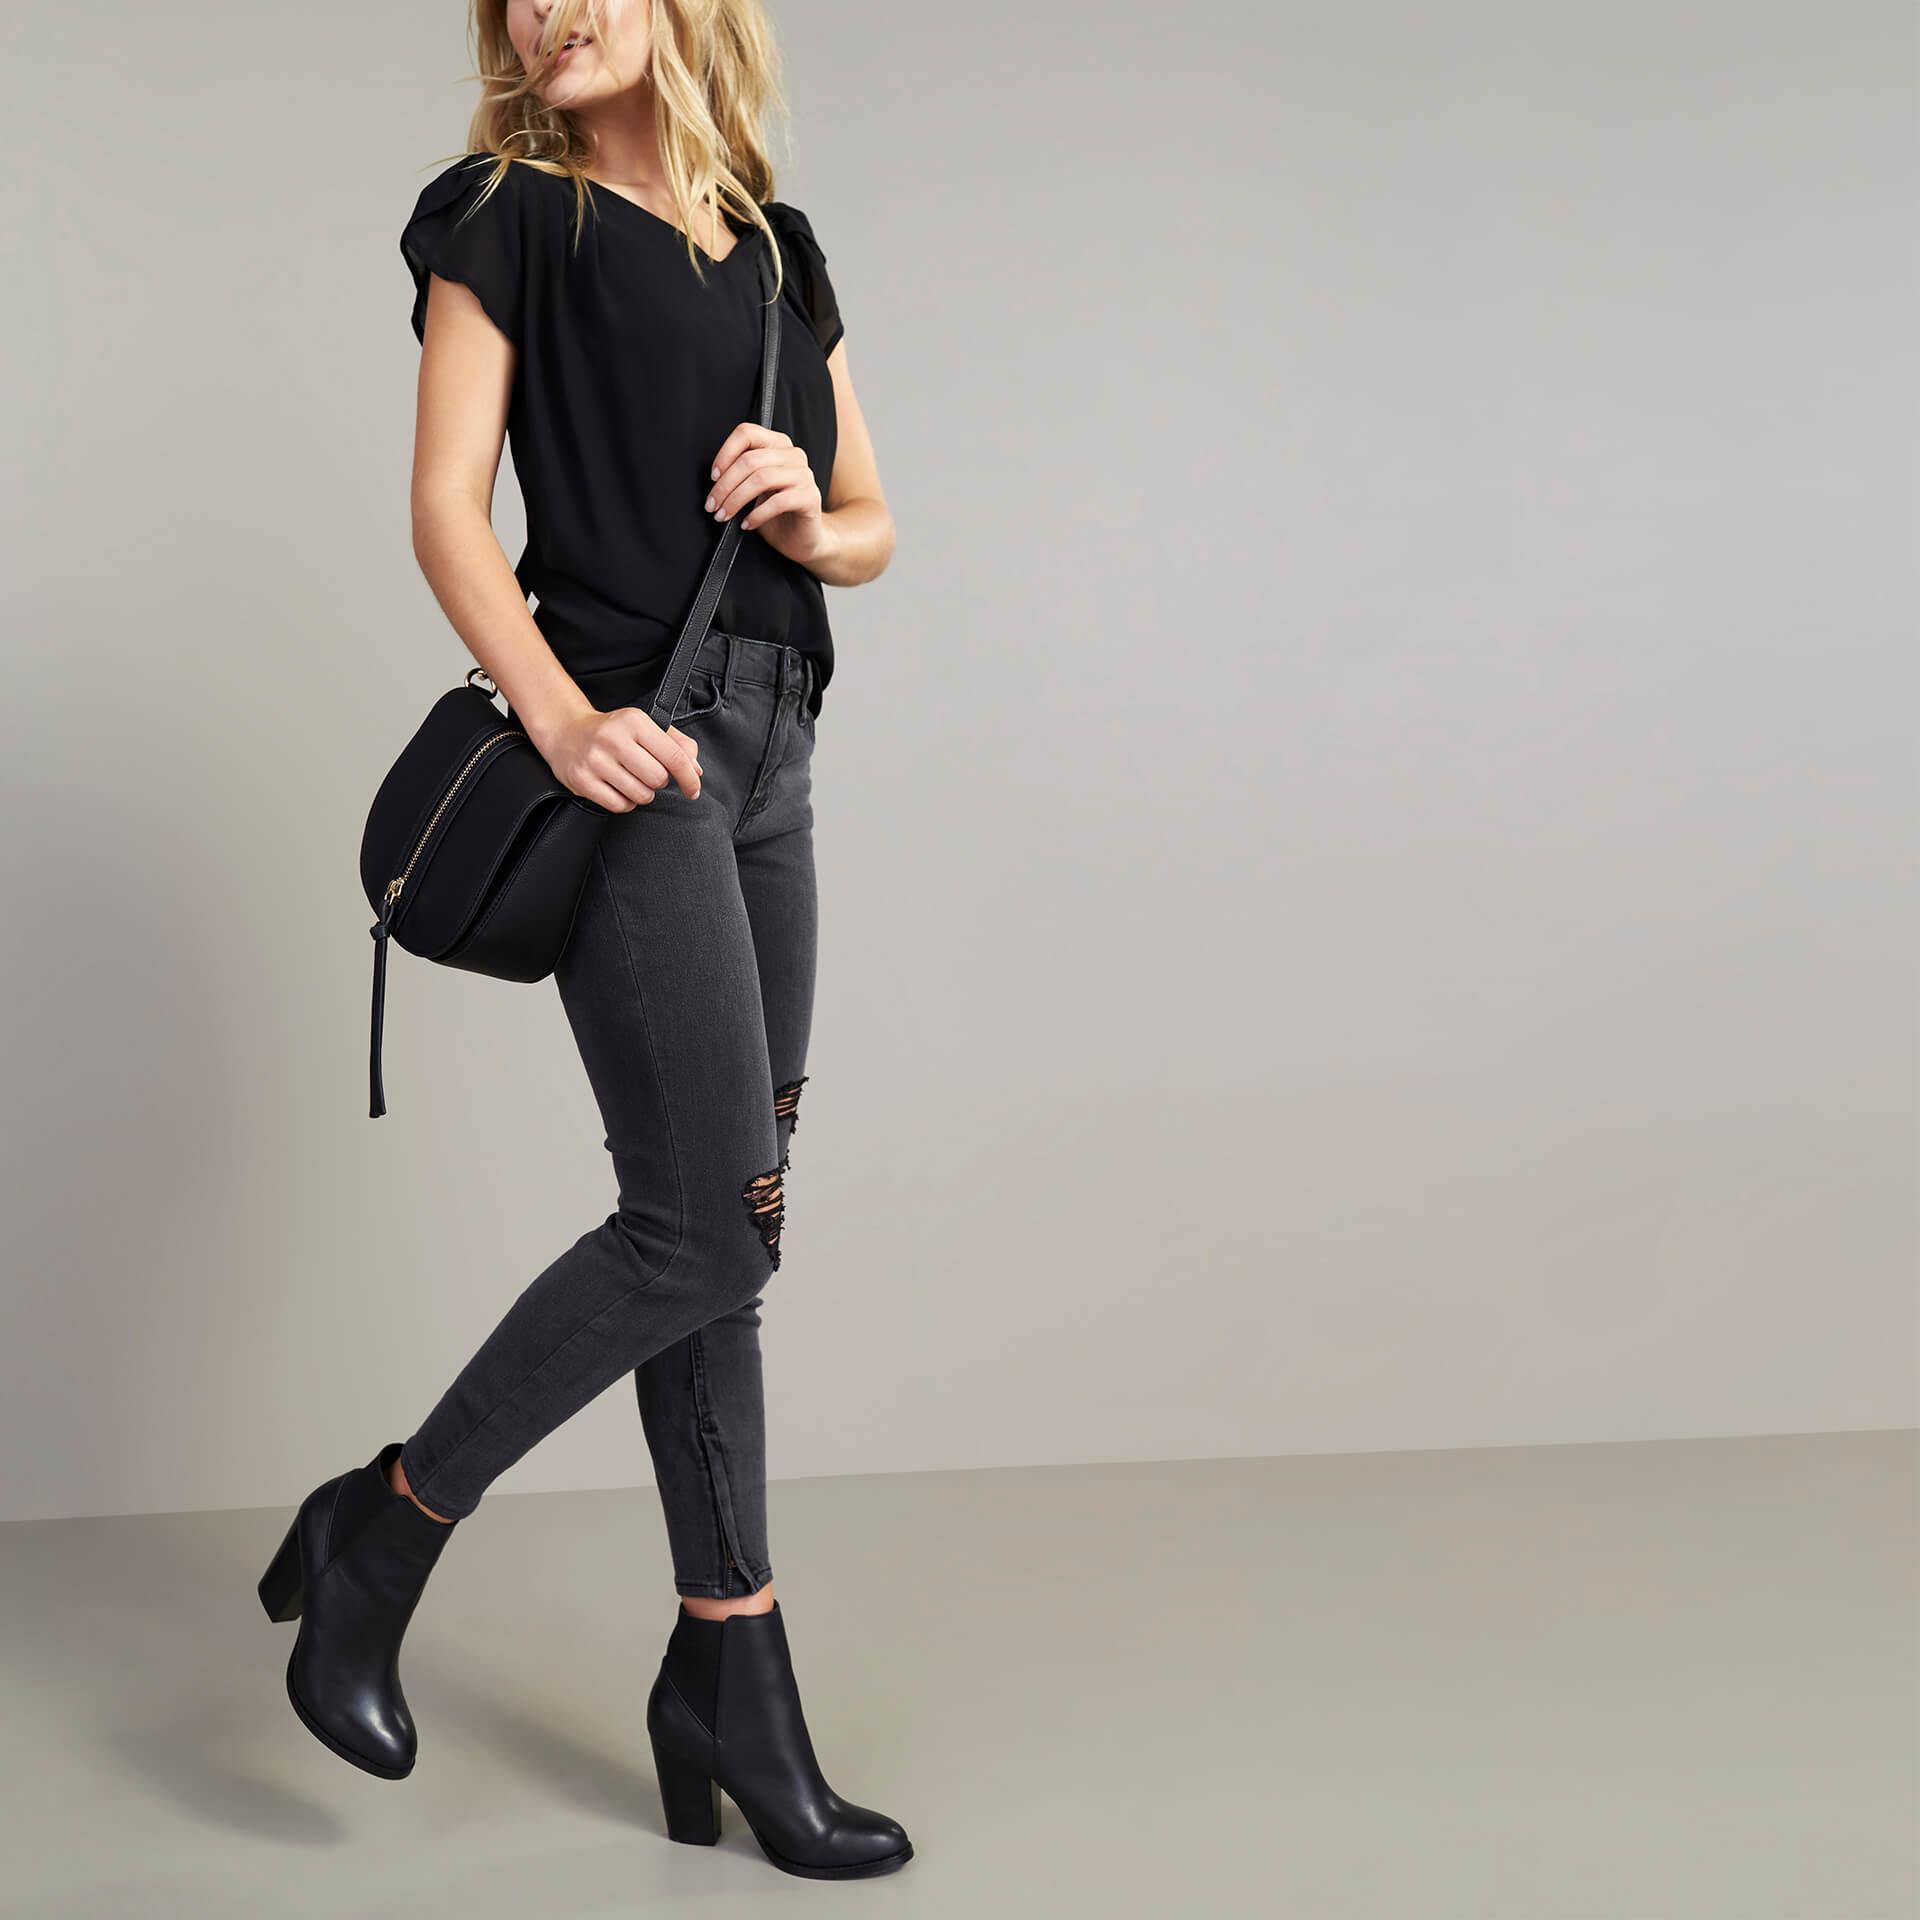 fa109ad5866a I m petite! What boots should I wear